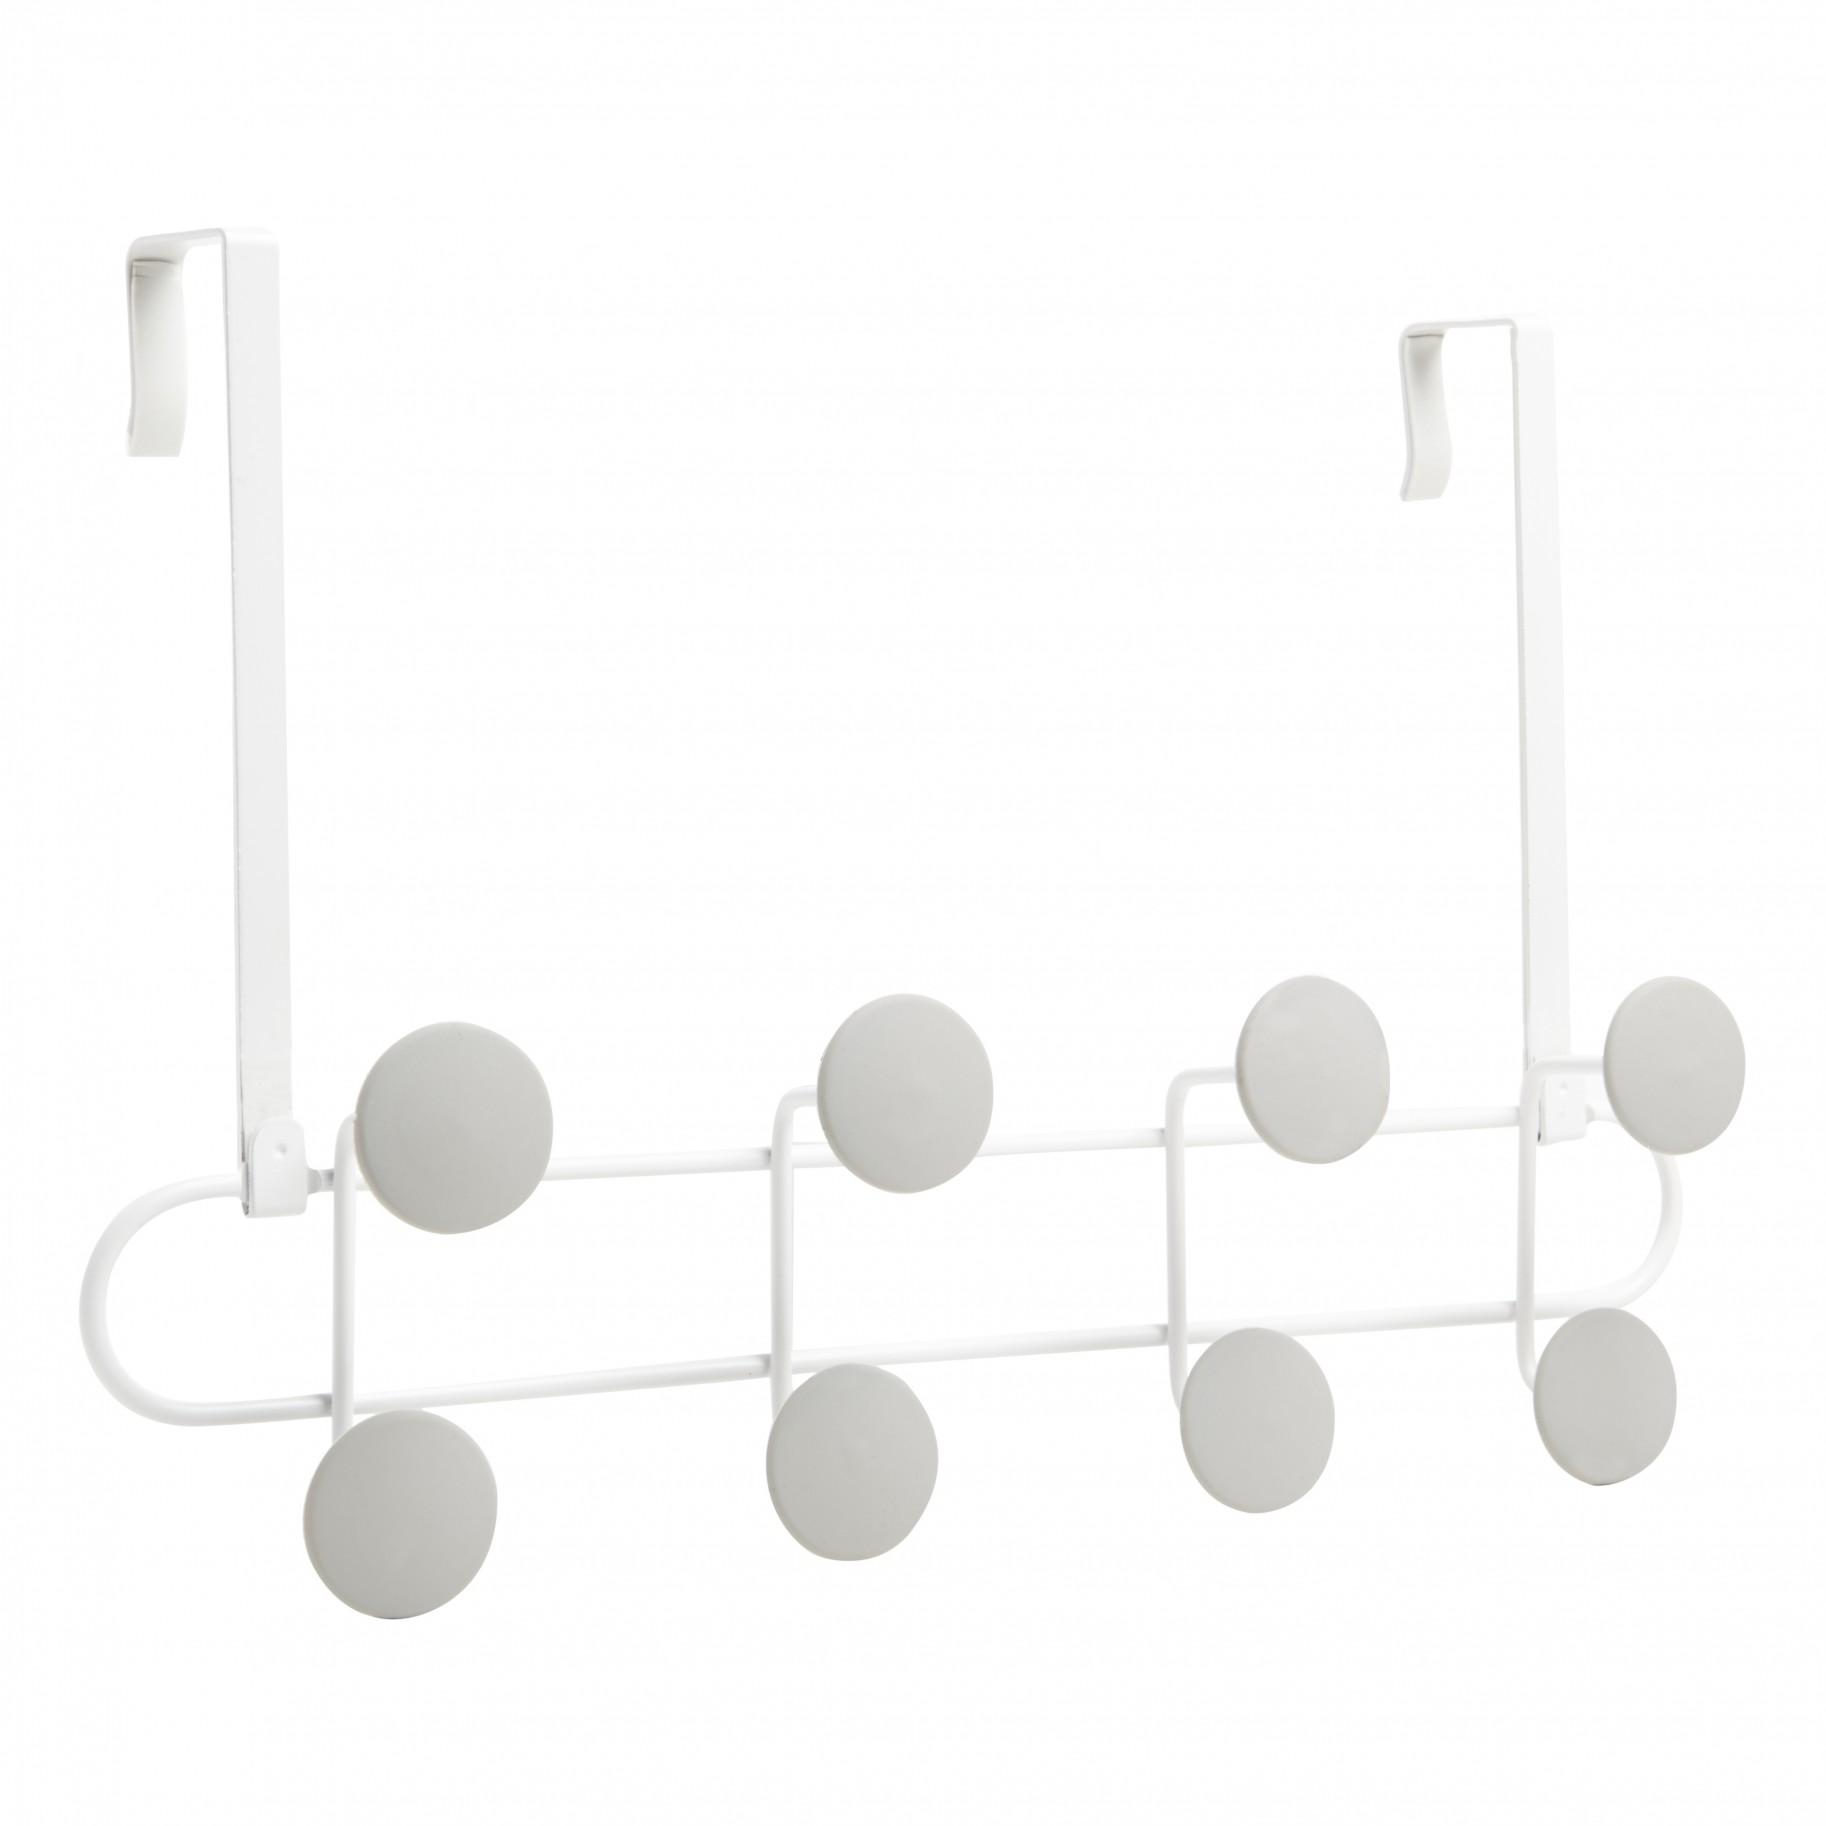 Porte-manteaux-design-Yook-Umbra-010